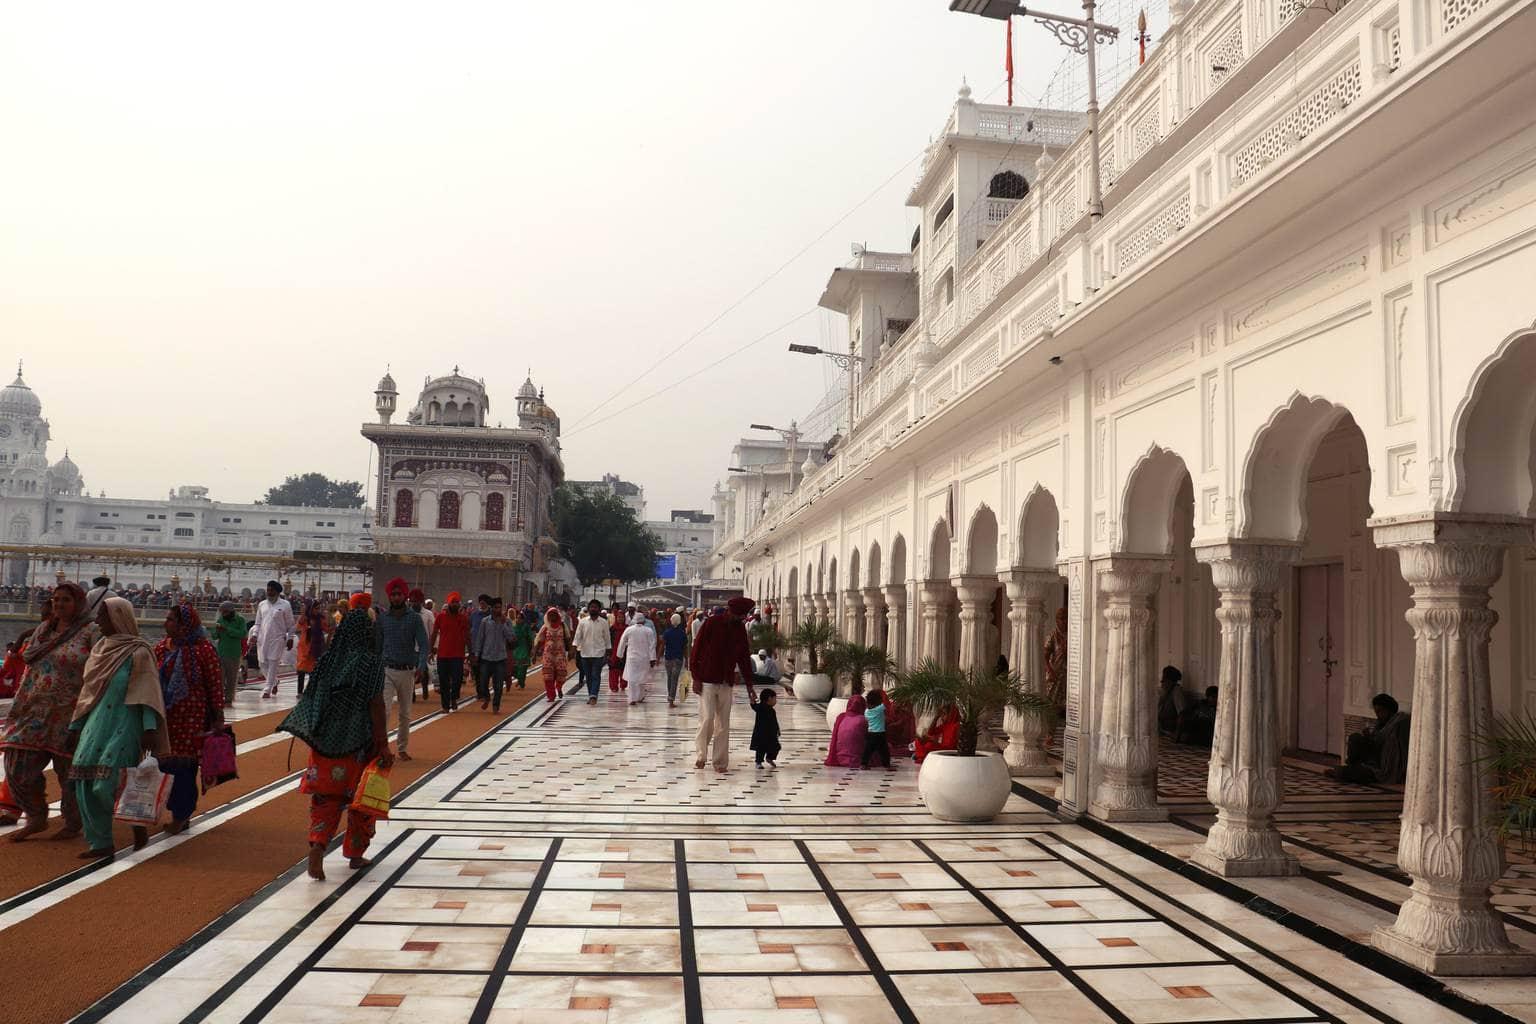 The Golden Temple Amritsar